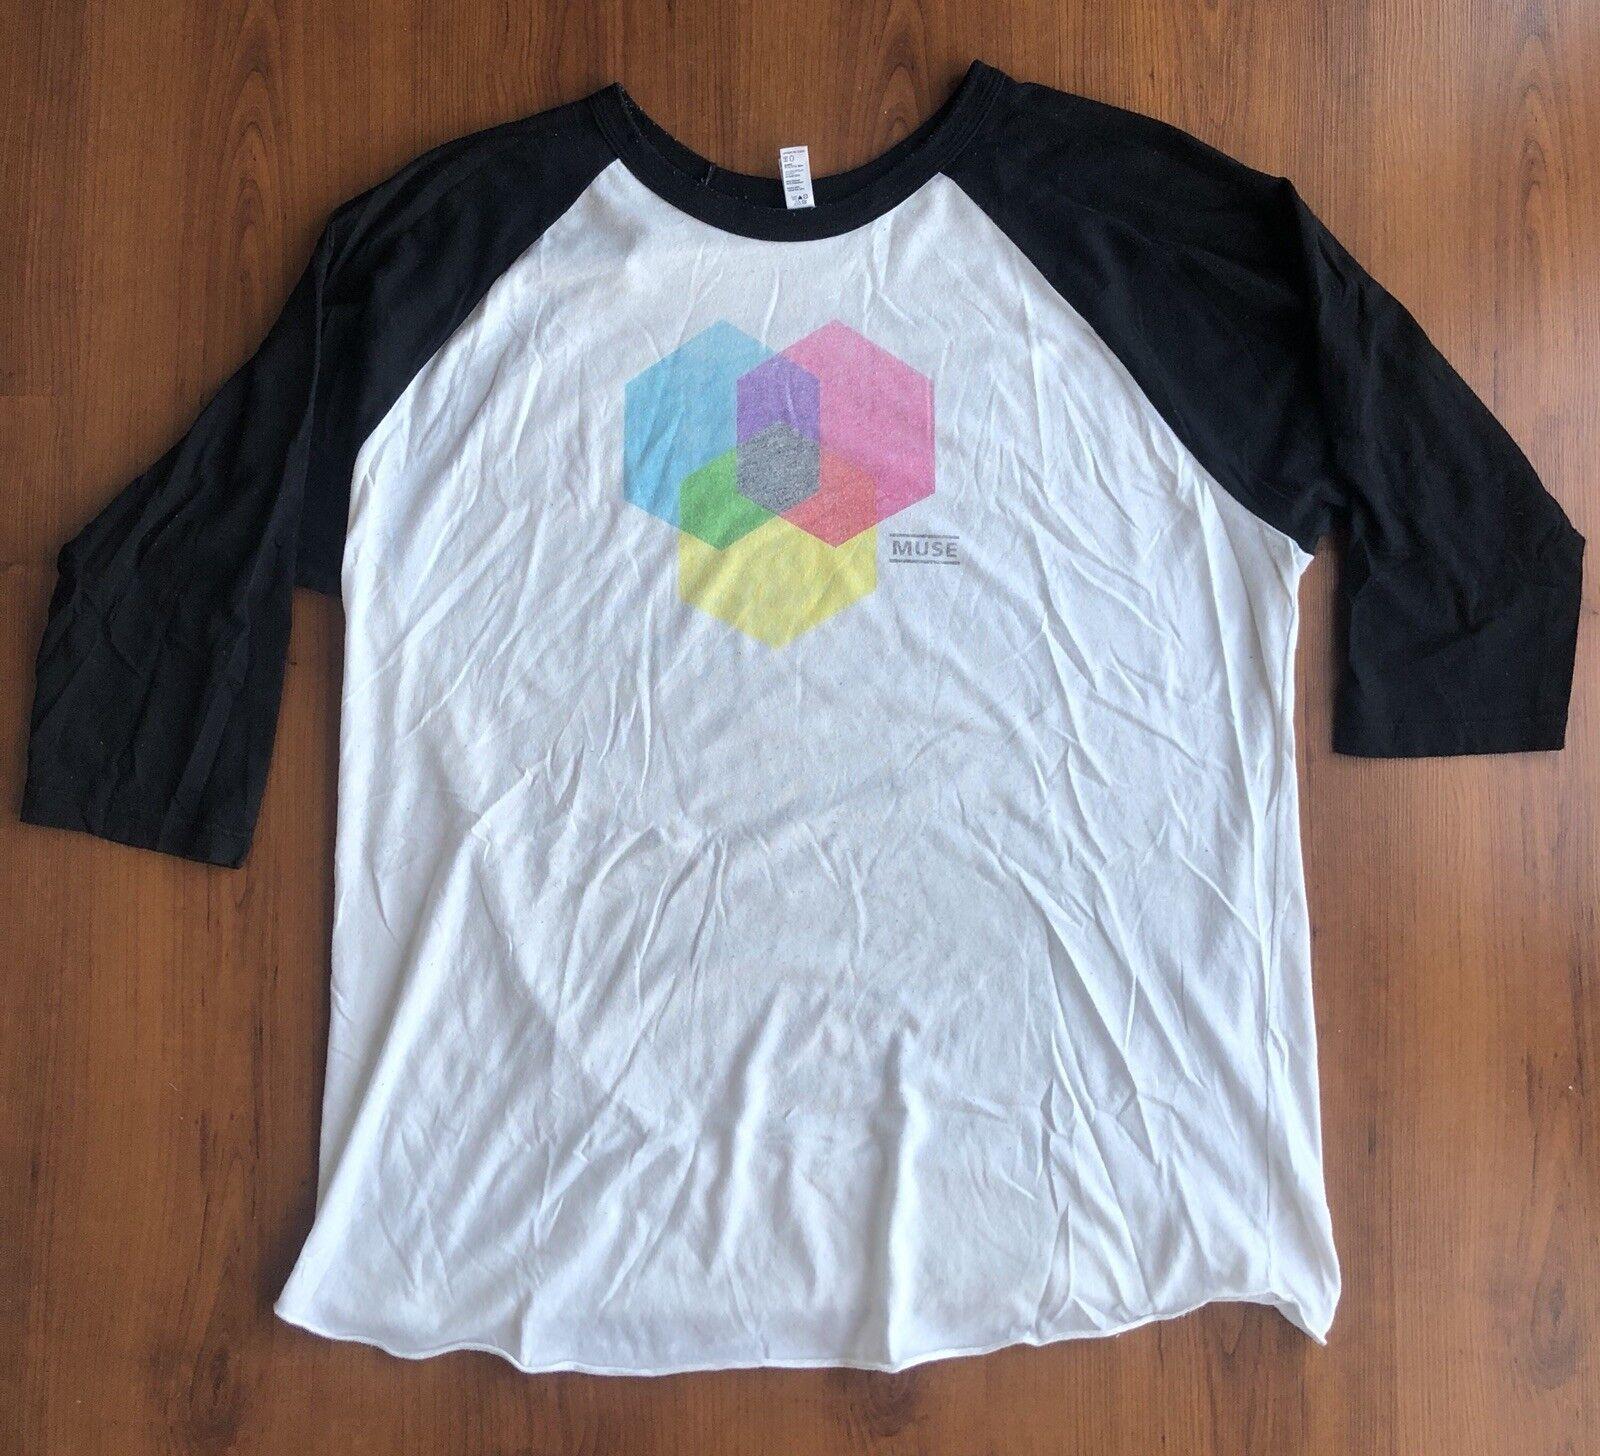 Rare vintage Muse baseball sleeved concert T-shirt - XL- The Resistance Tour